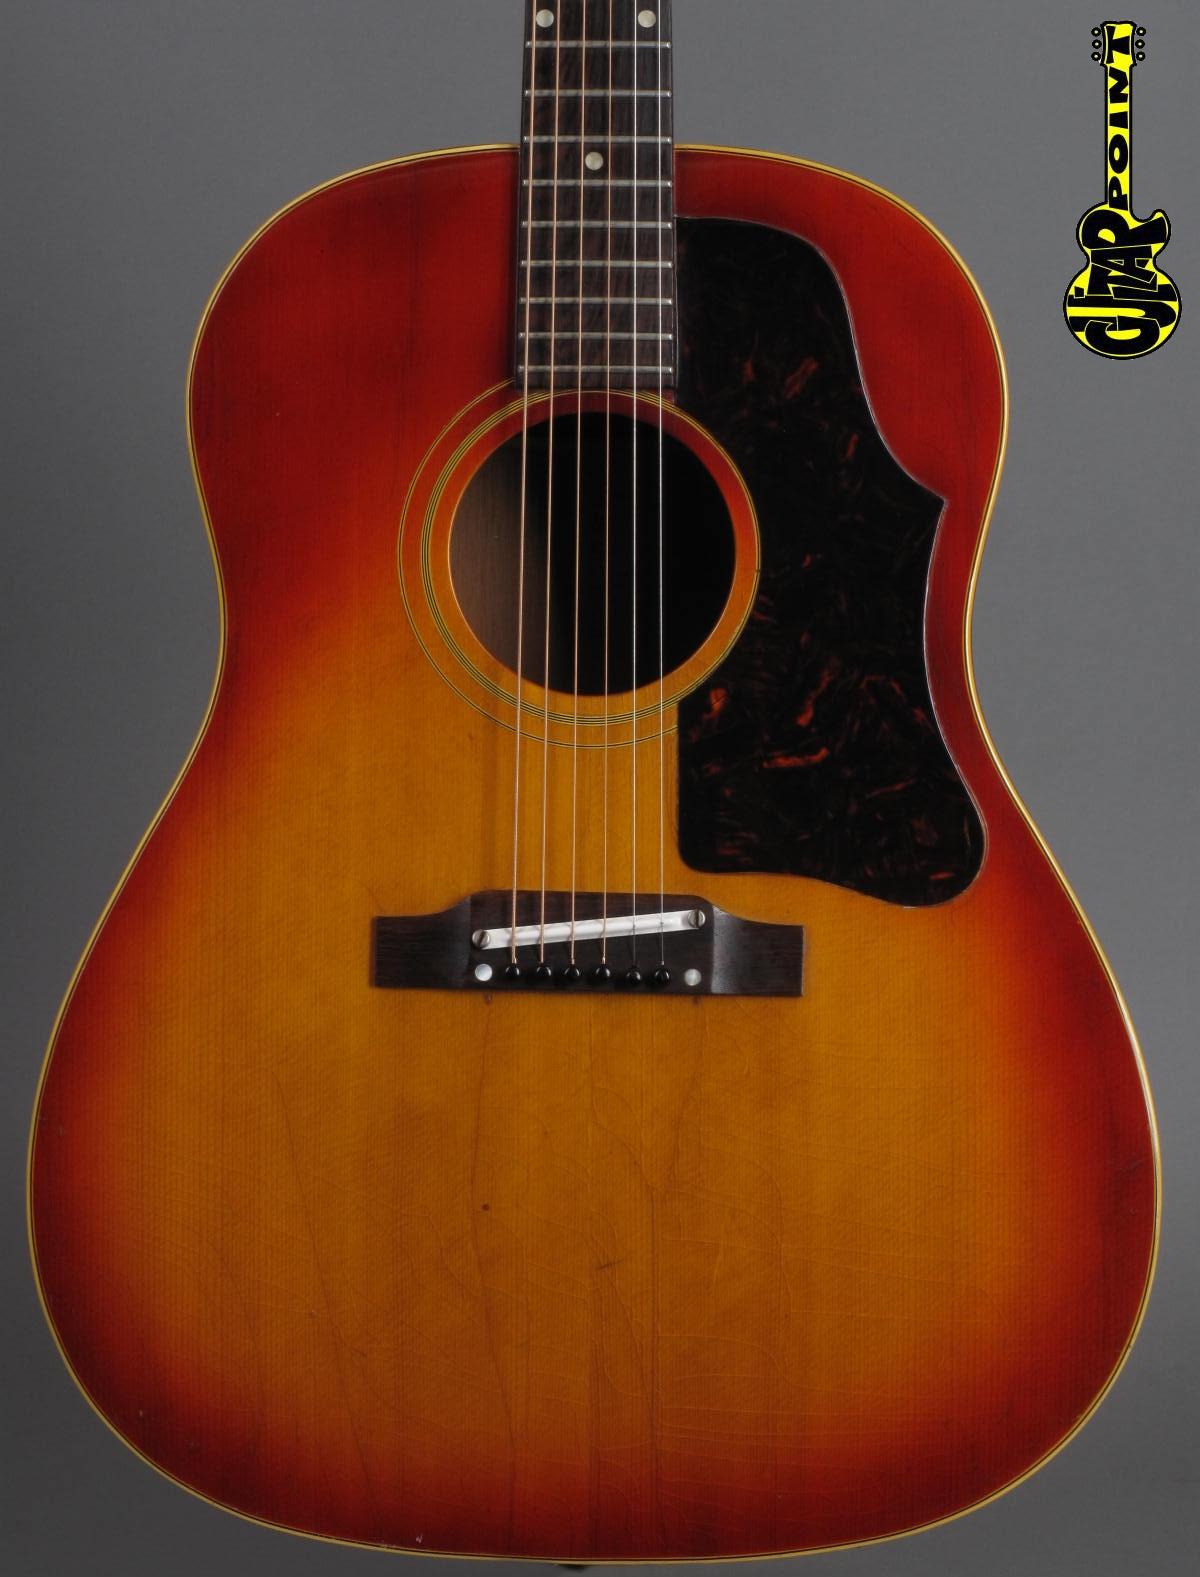 1962 Gibson J-45 - Cherry Sunburst